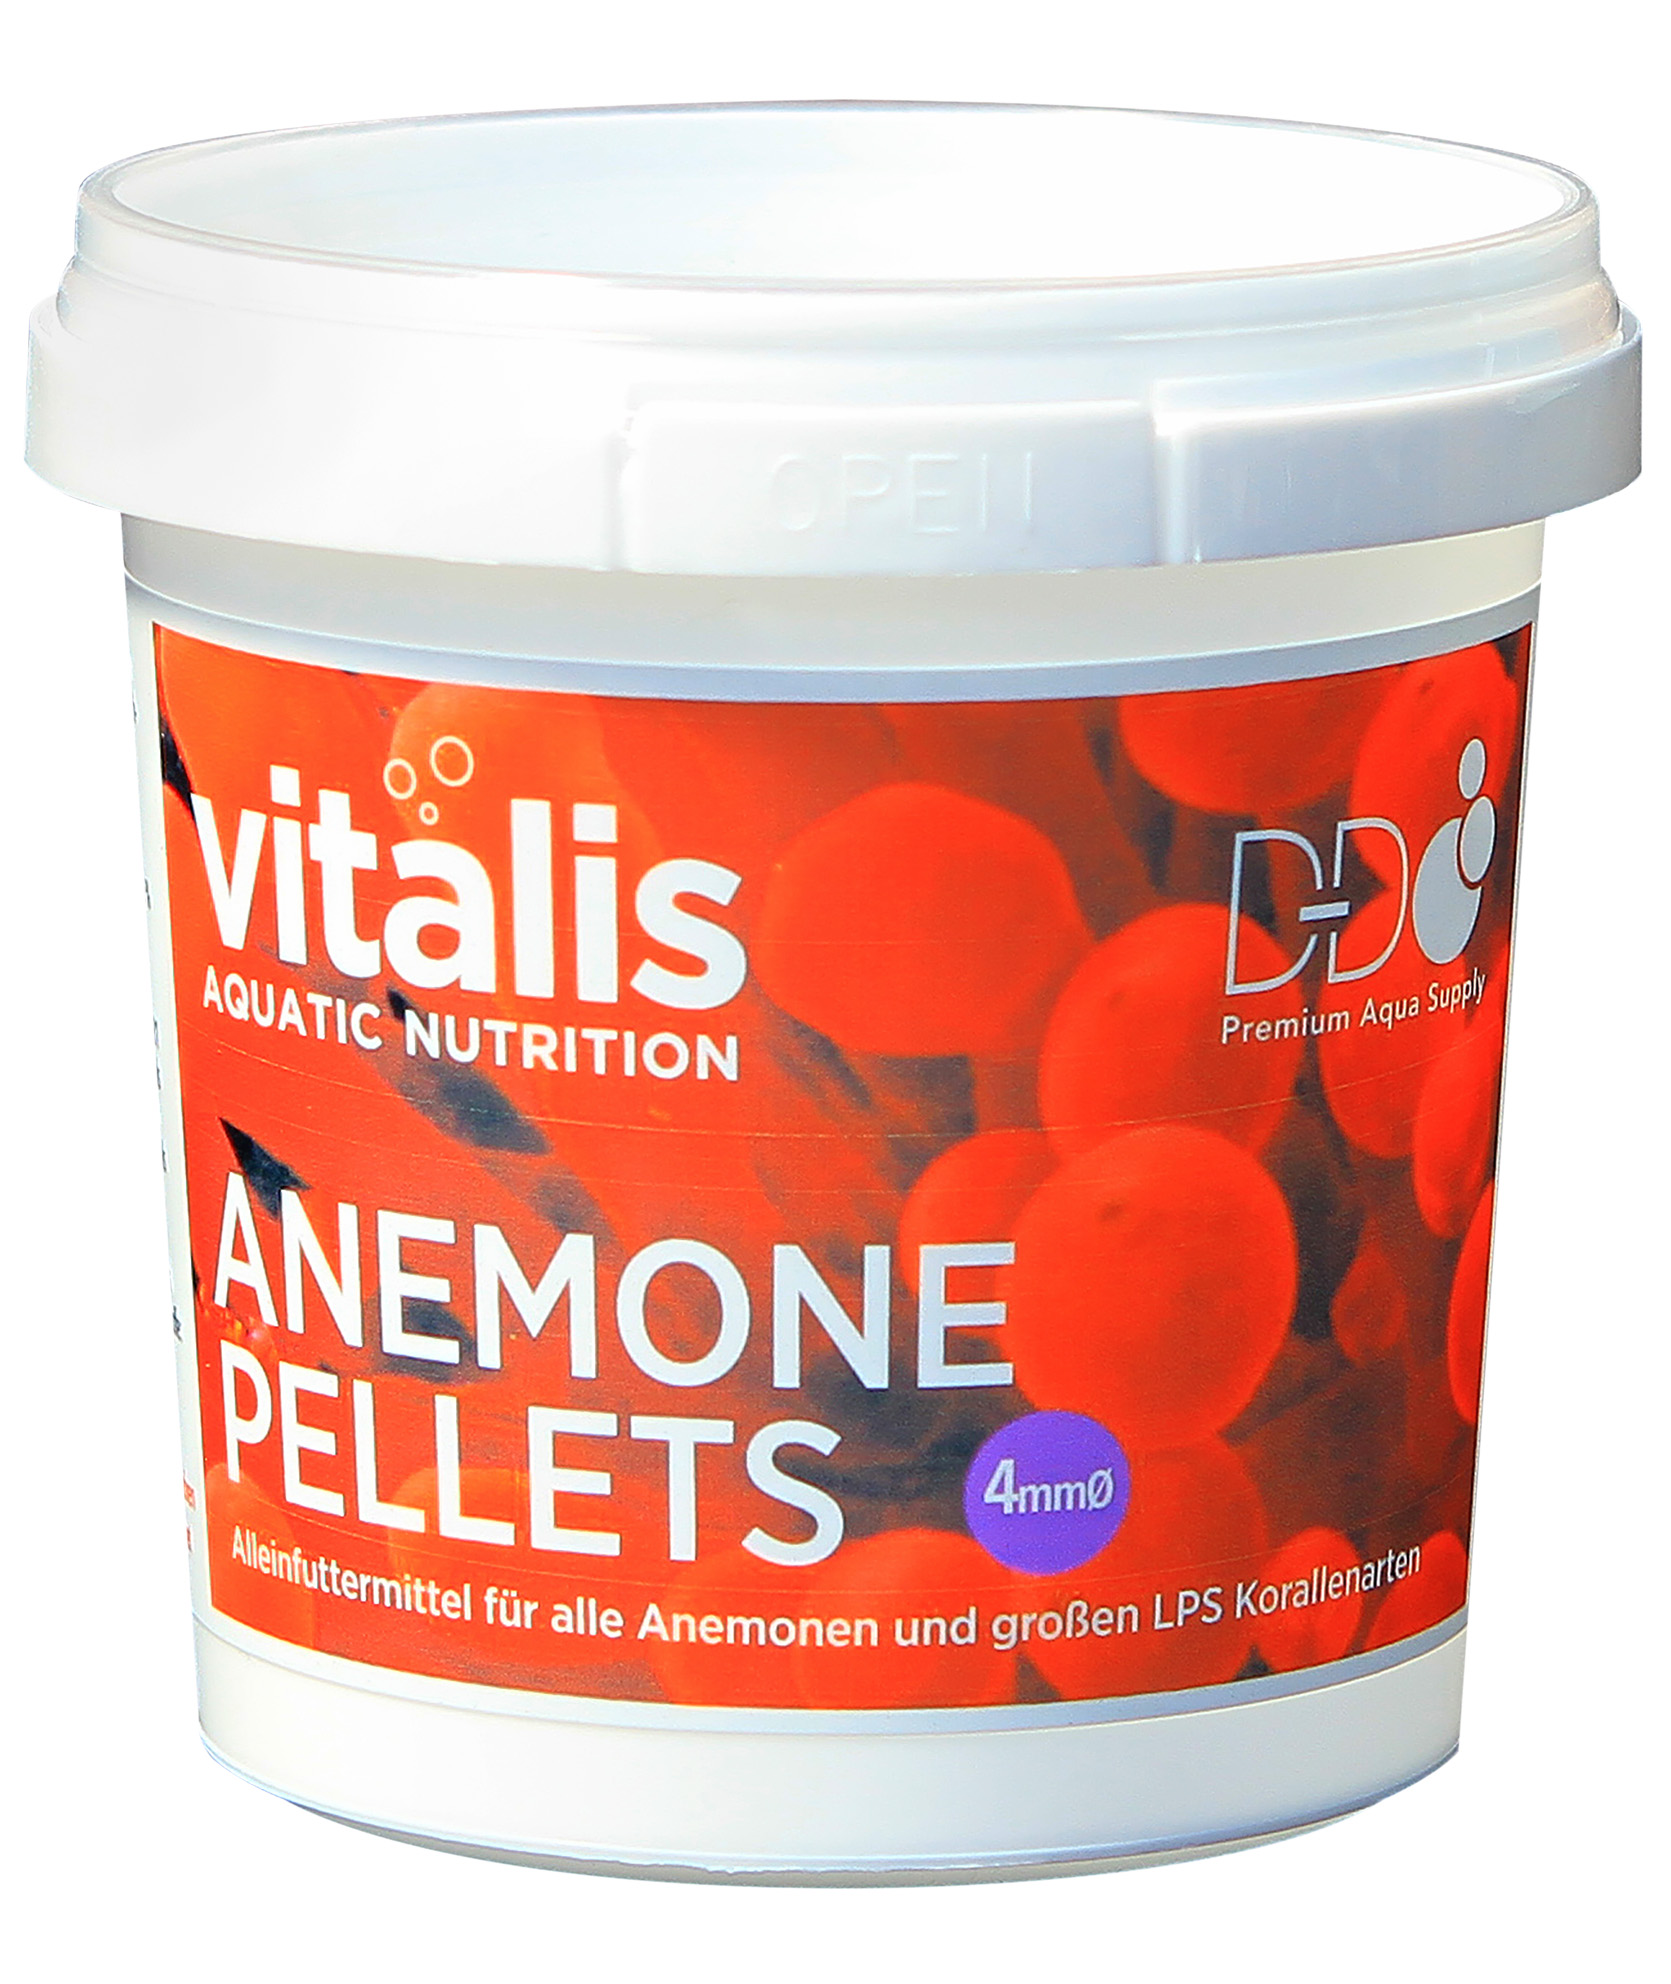 Vitalis Coral Food - Anemone Pellets 4mm 60g